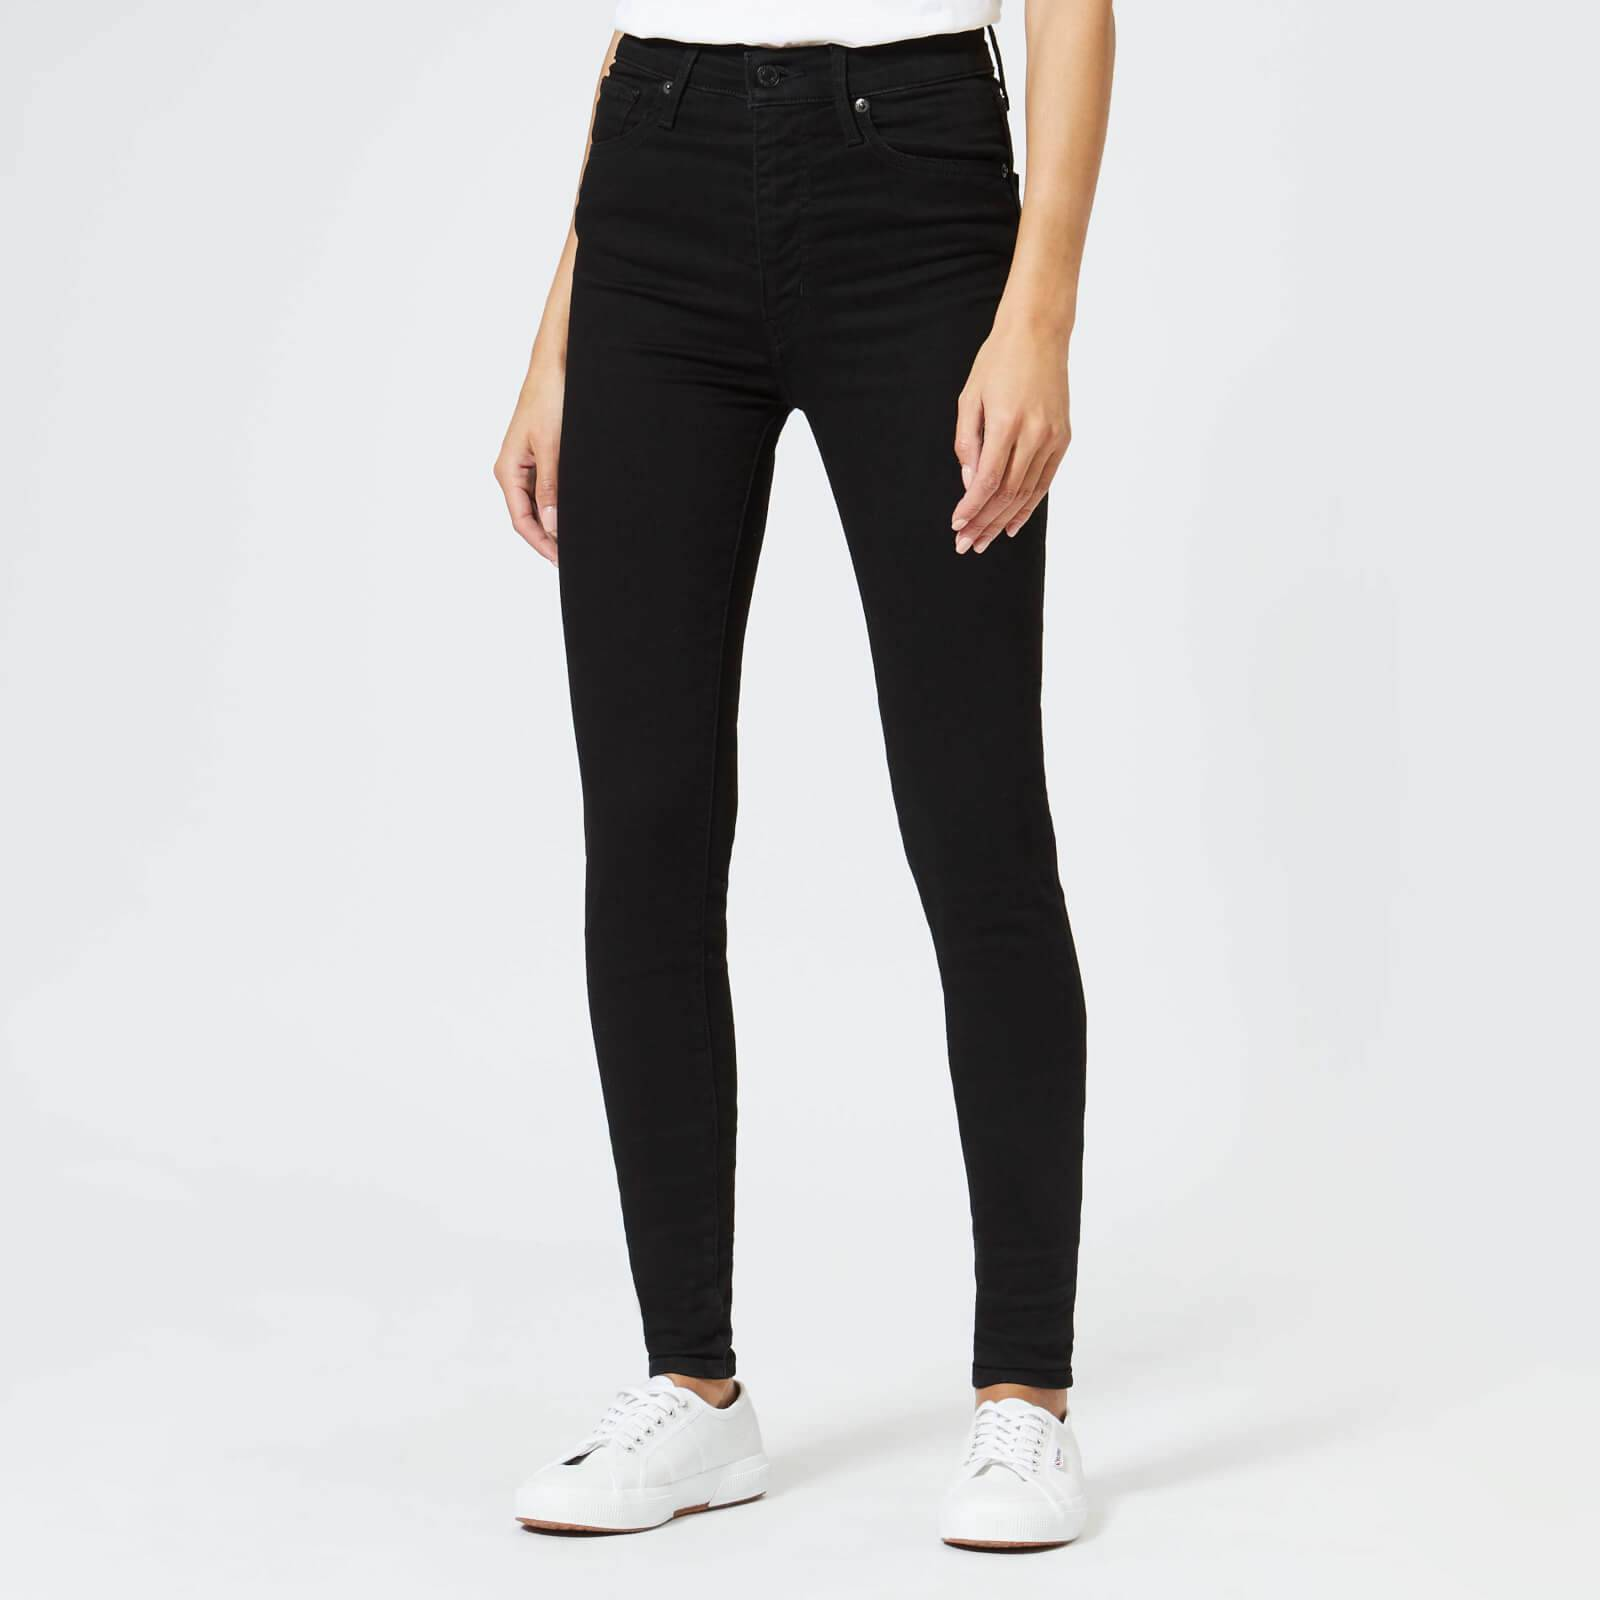 Levi's s Mile High Super Skinny Jeans - Black Galaxy - W27/L32